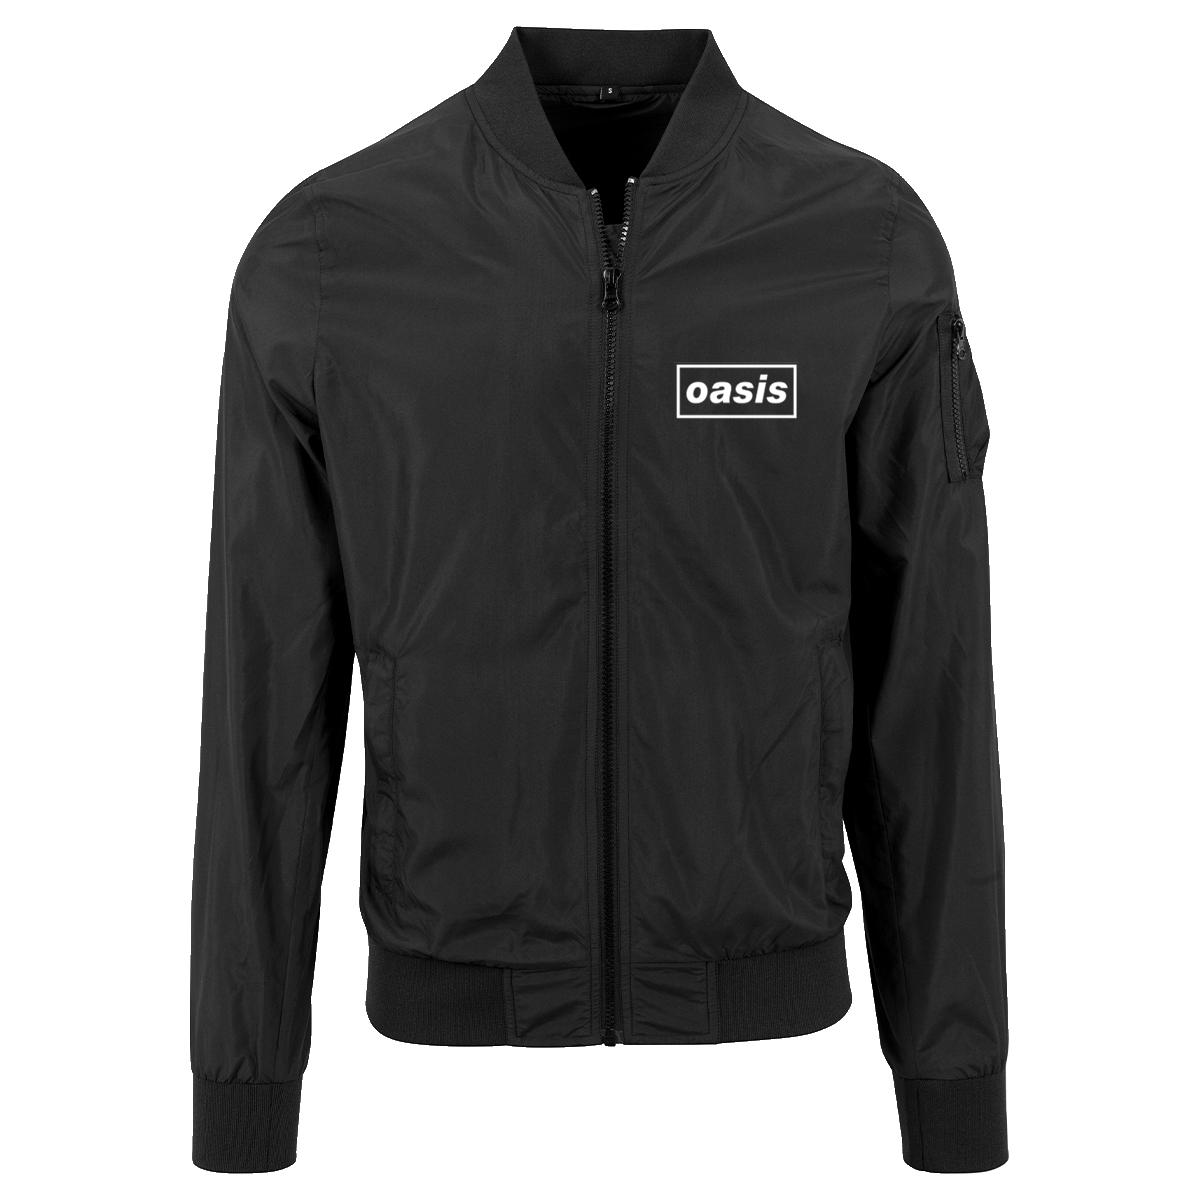 Buy Online Oasis - Oasis Black Bomber Jacket